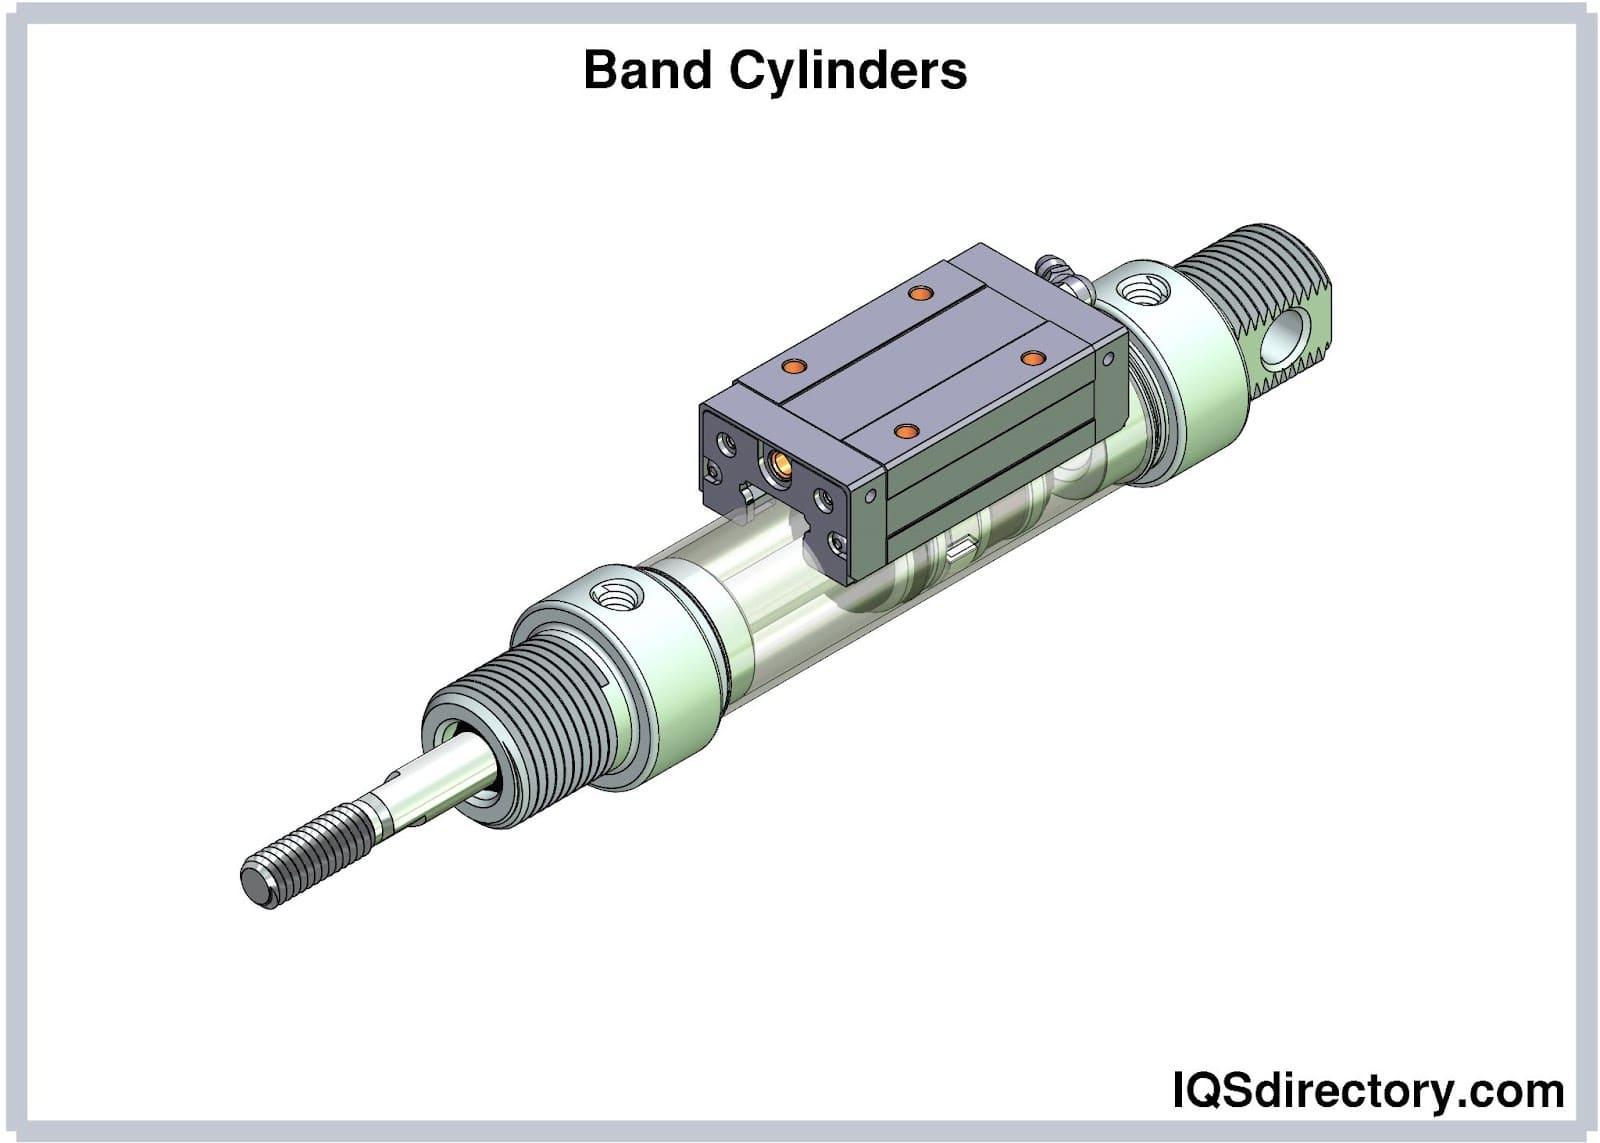 Band Cylinders